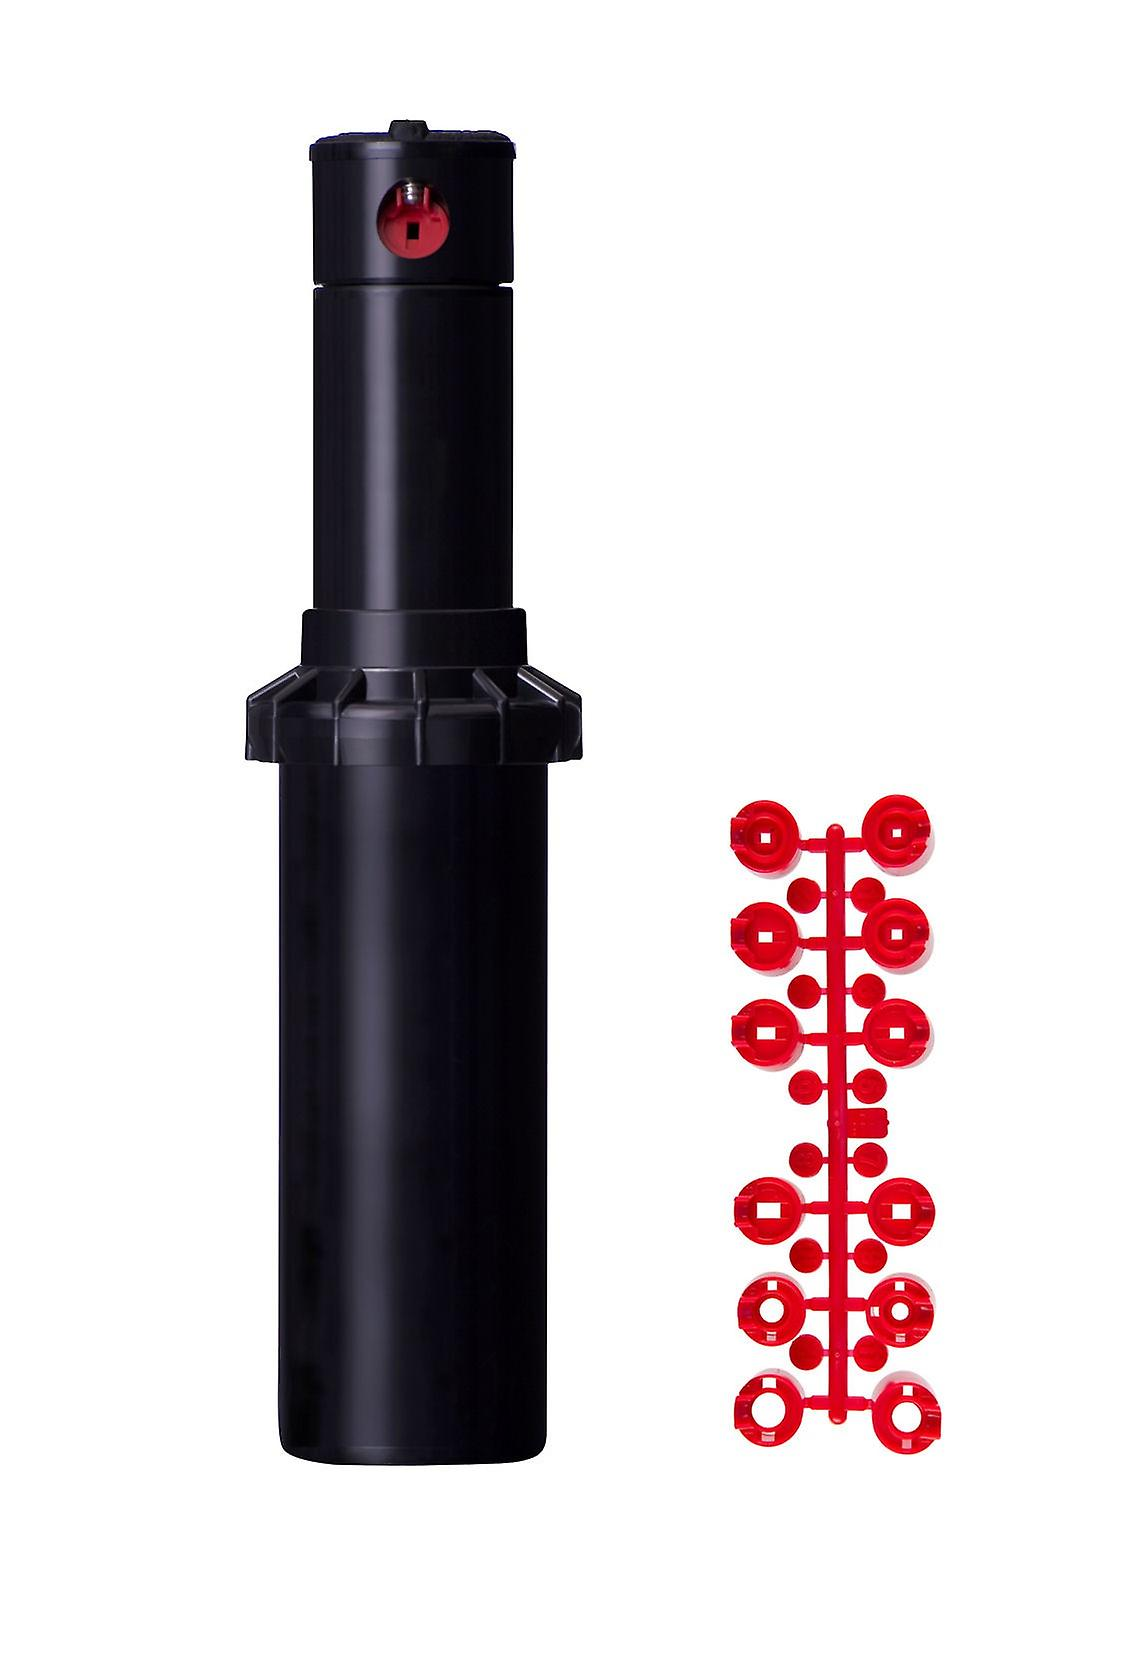 Hunter PGP-ADJ  10 cm pop-up, Adjustable arc, 12 Red nozzles rack